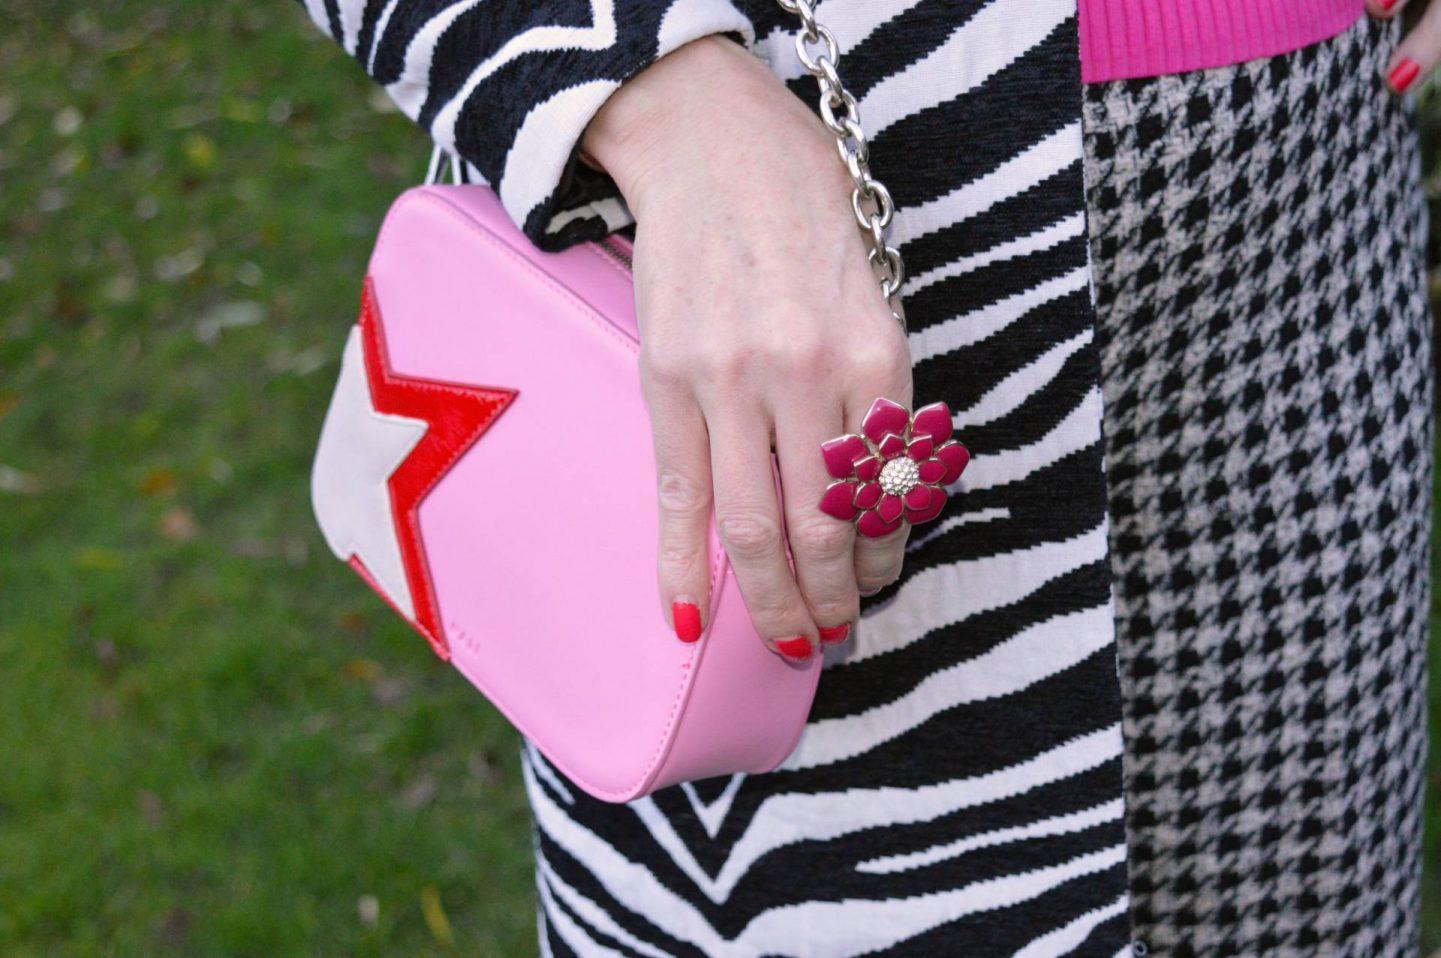 Zara houndstooth trousers, Marks & Spencer pink satin sock boots, pink star motif crossbody bag, pink flower ring